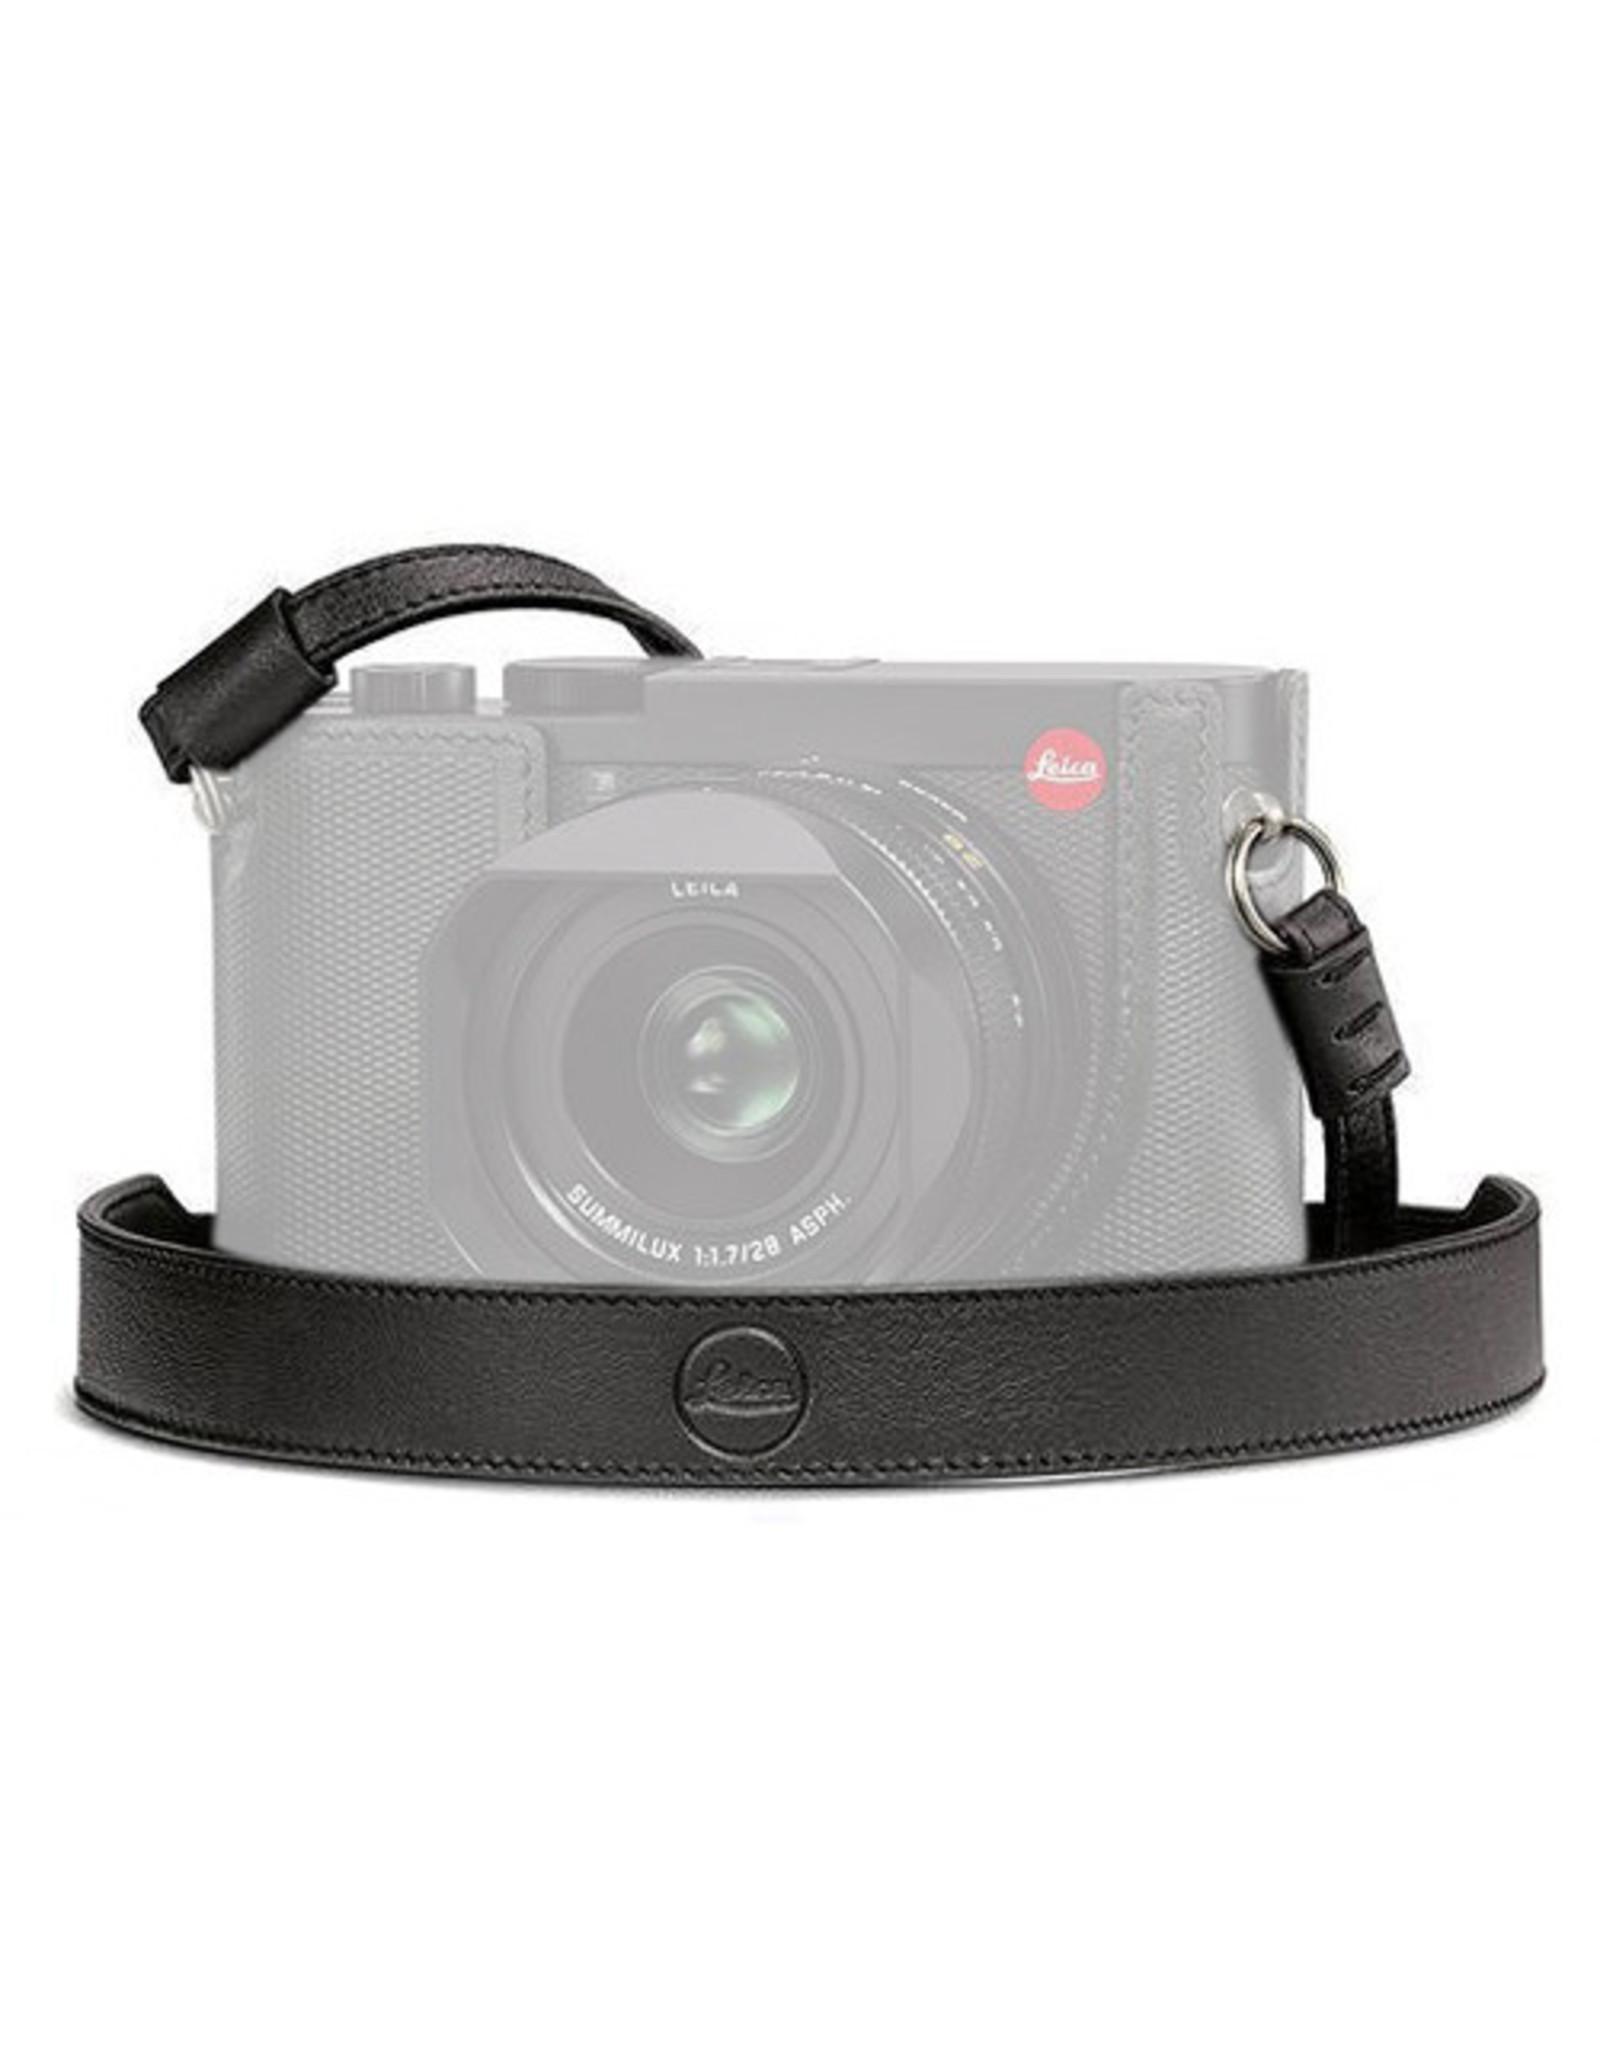 Leica Carrying Strap-Q2 Black   195-70